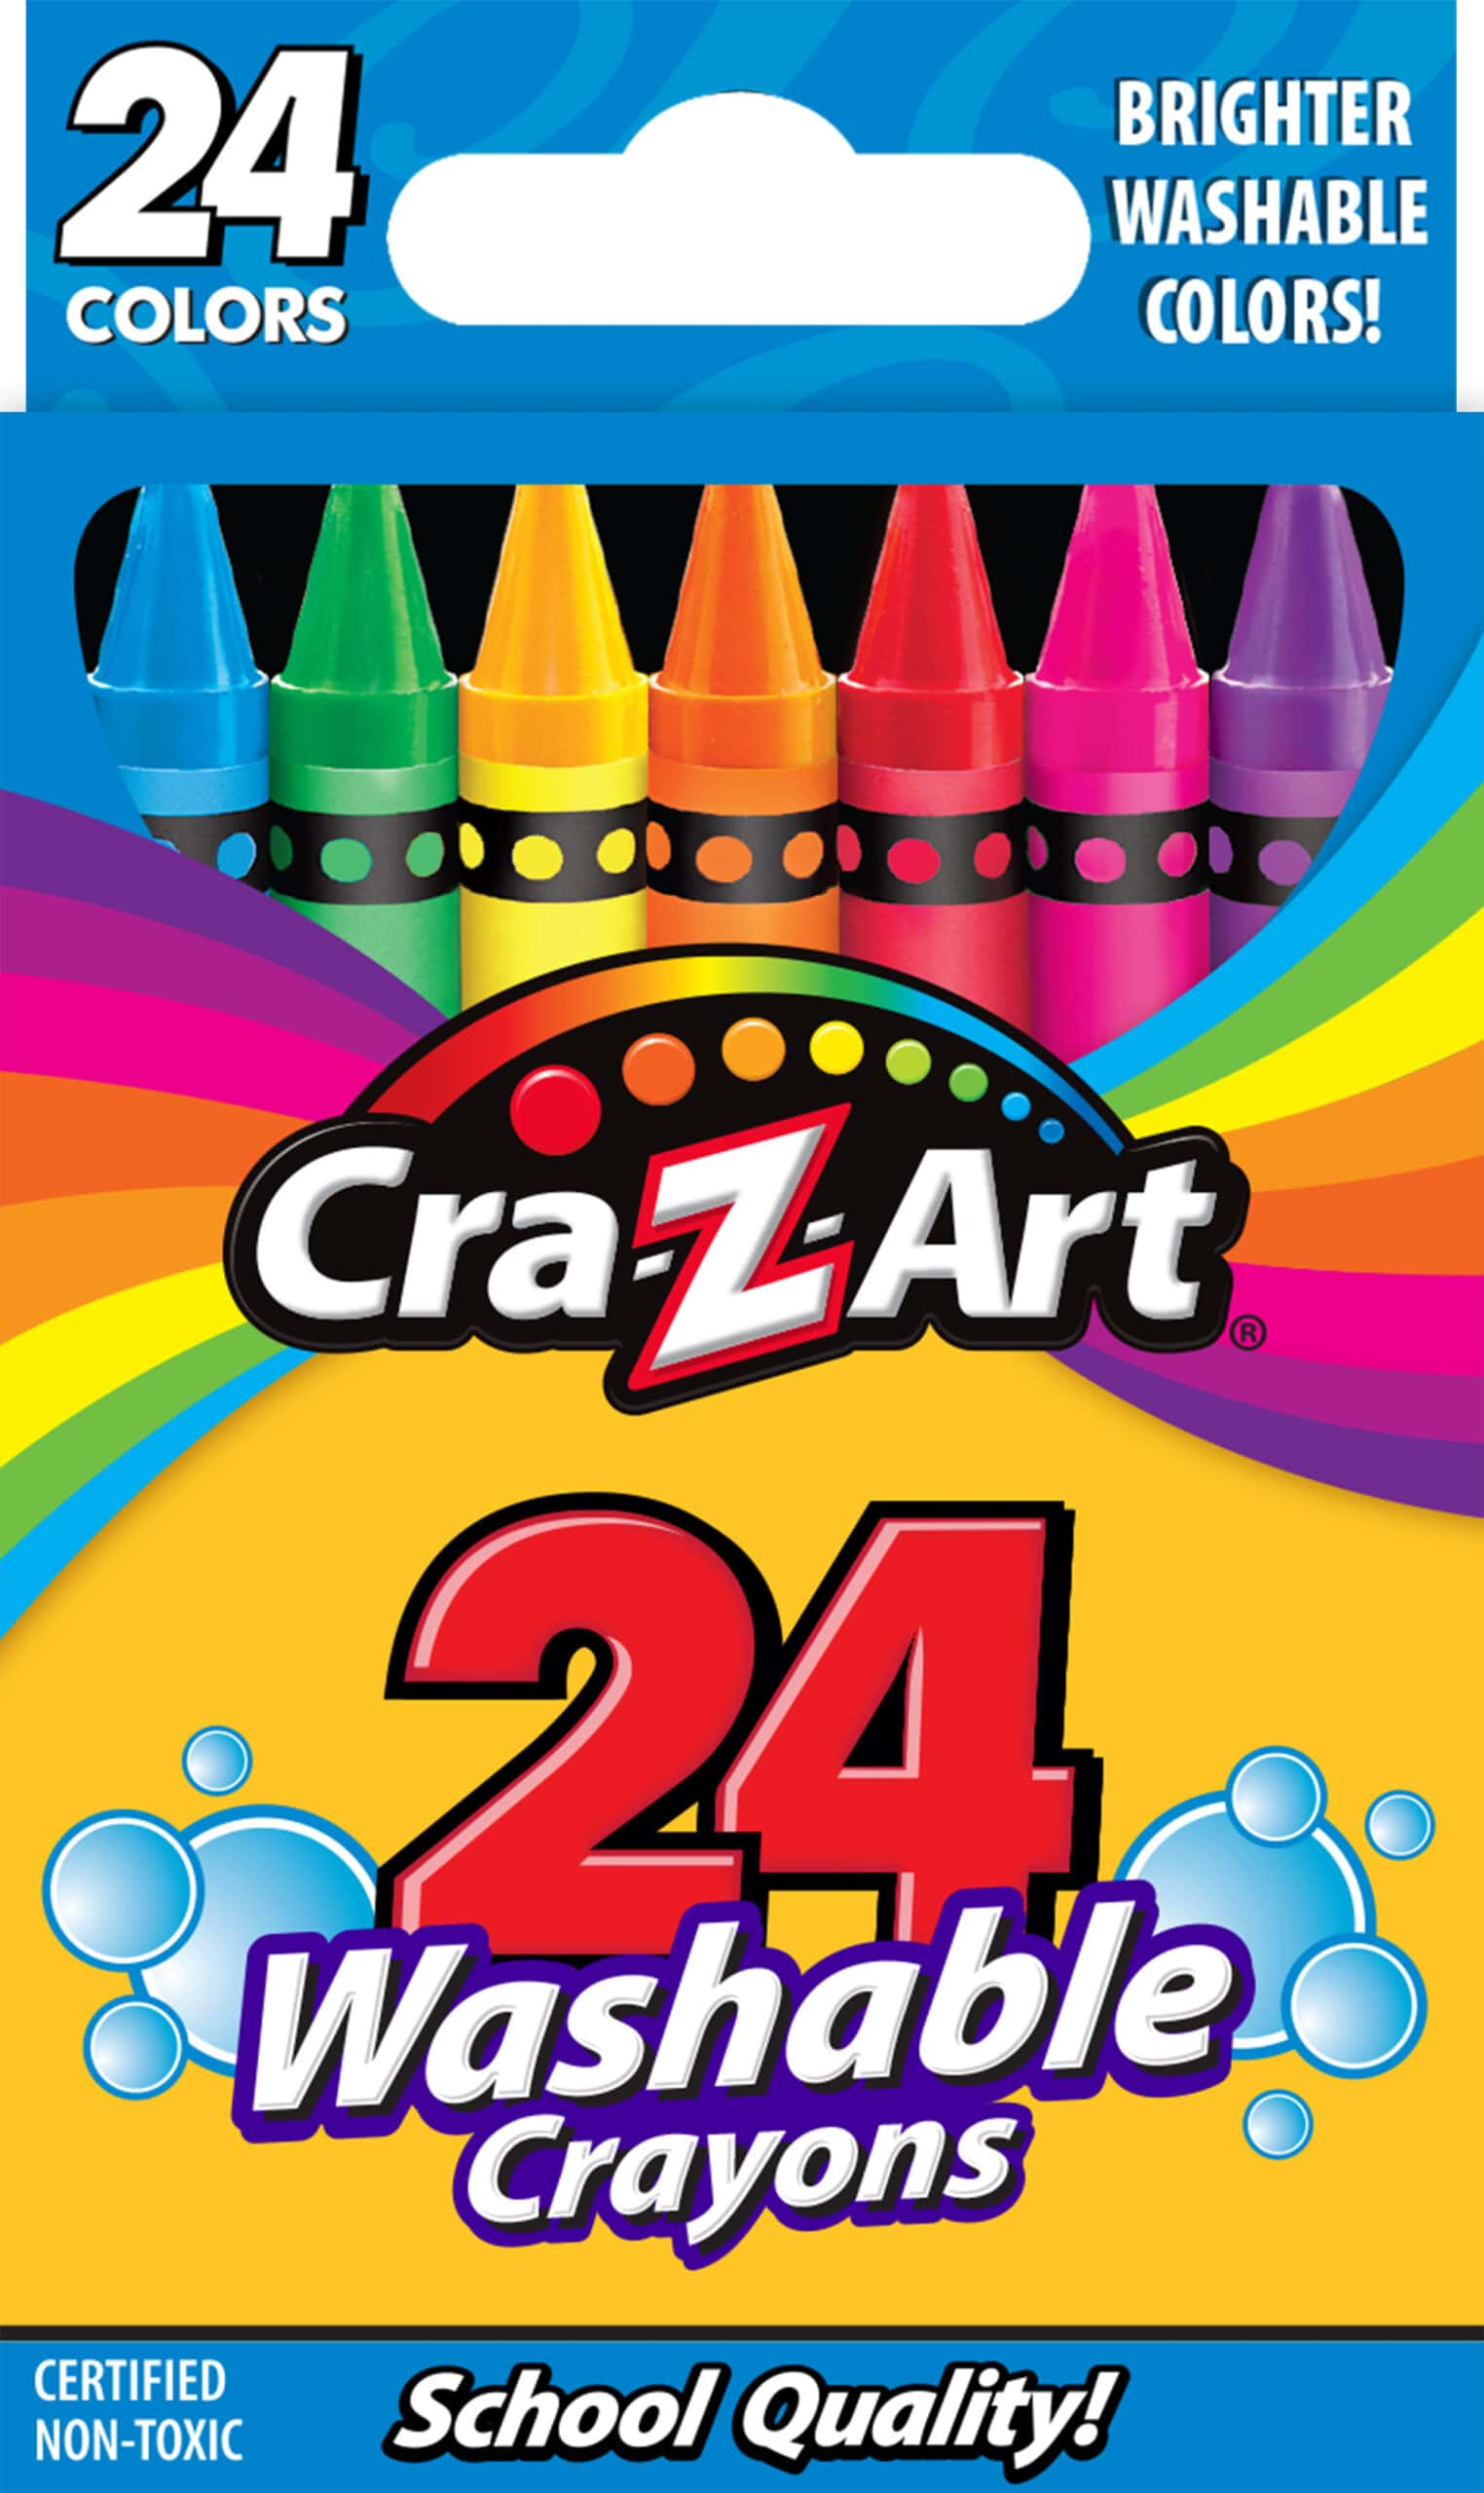 crazart crayons